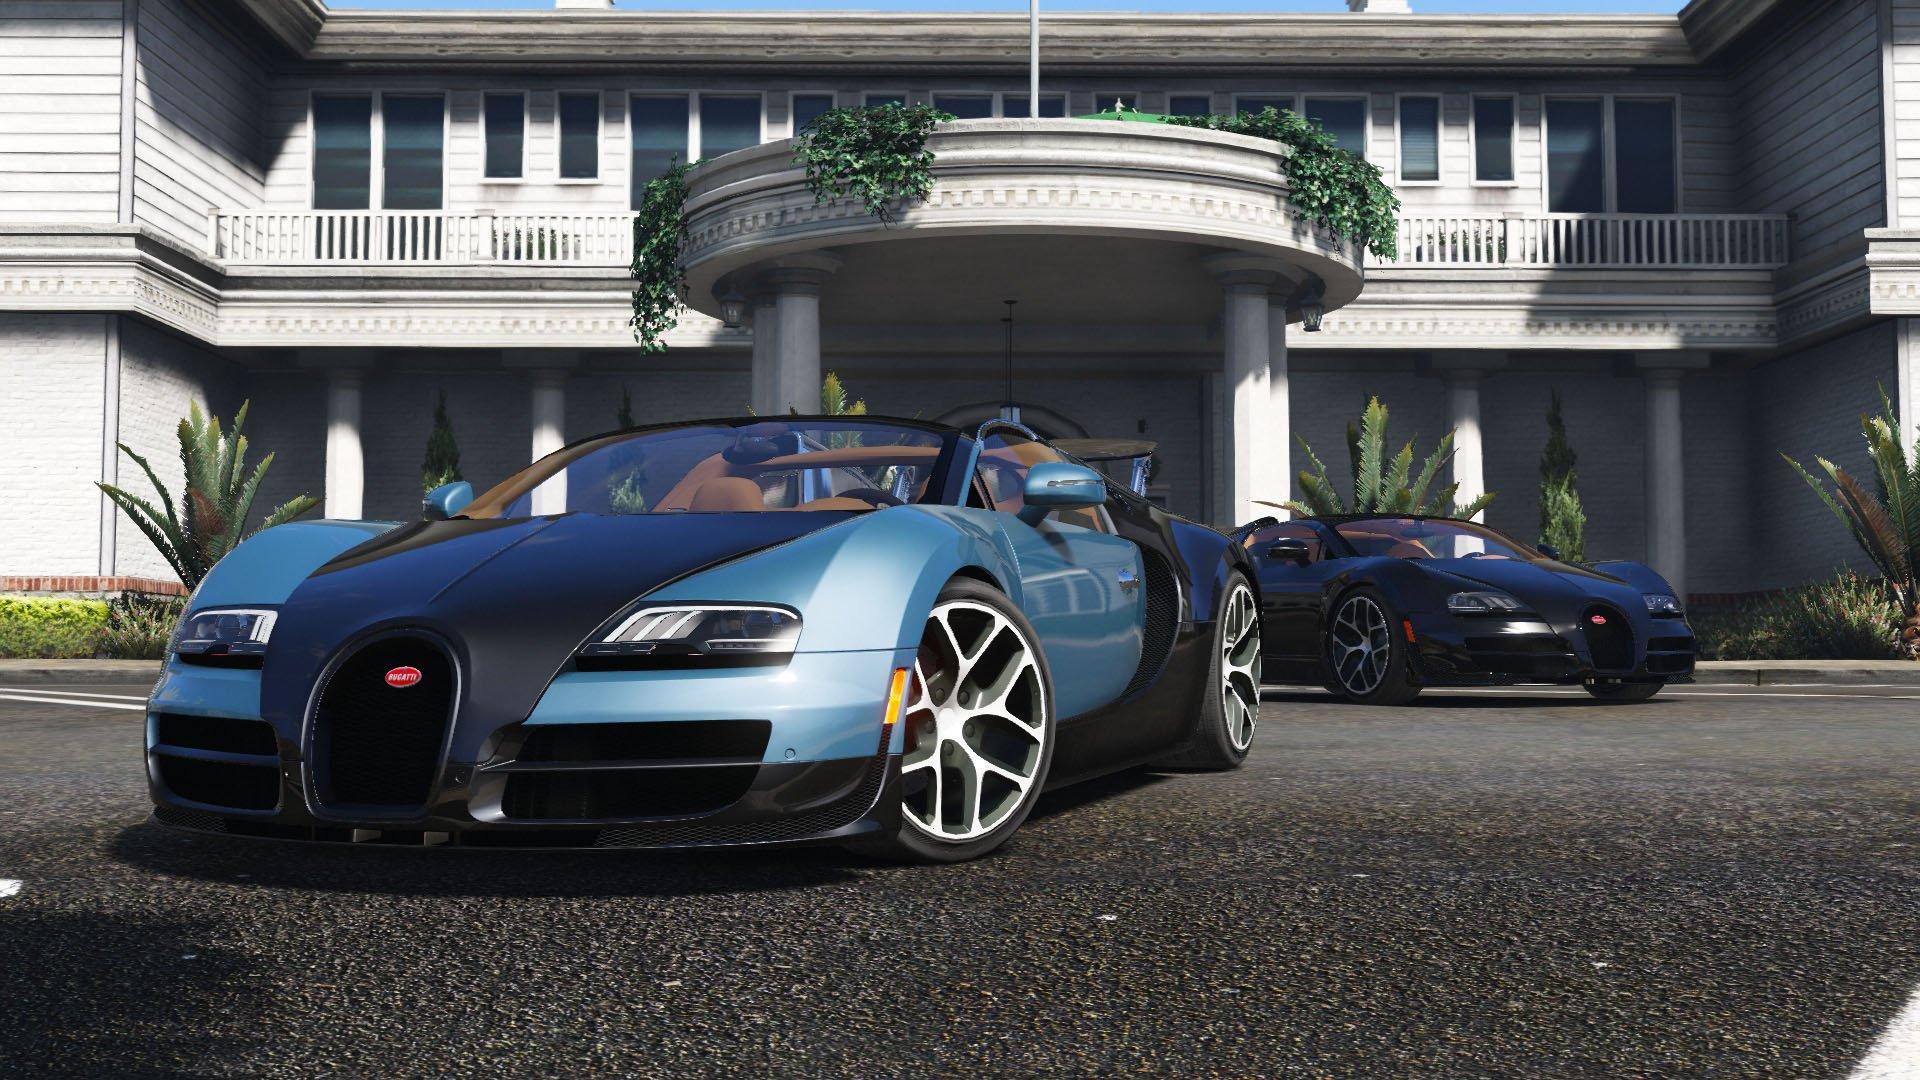 6e7907-3 Mesmerizing Bugatti Veyron Nfs Most Wanted Cars Trend